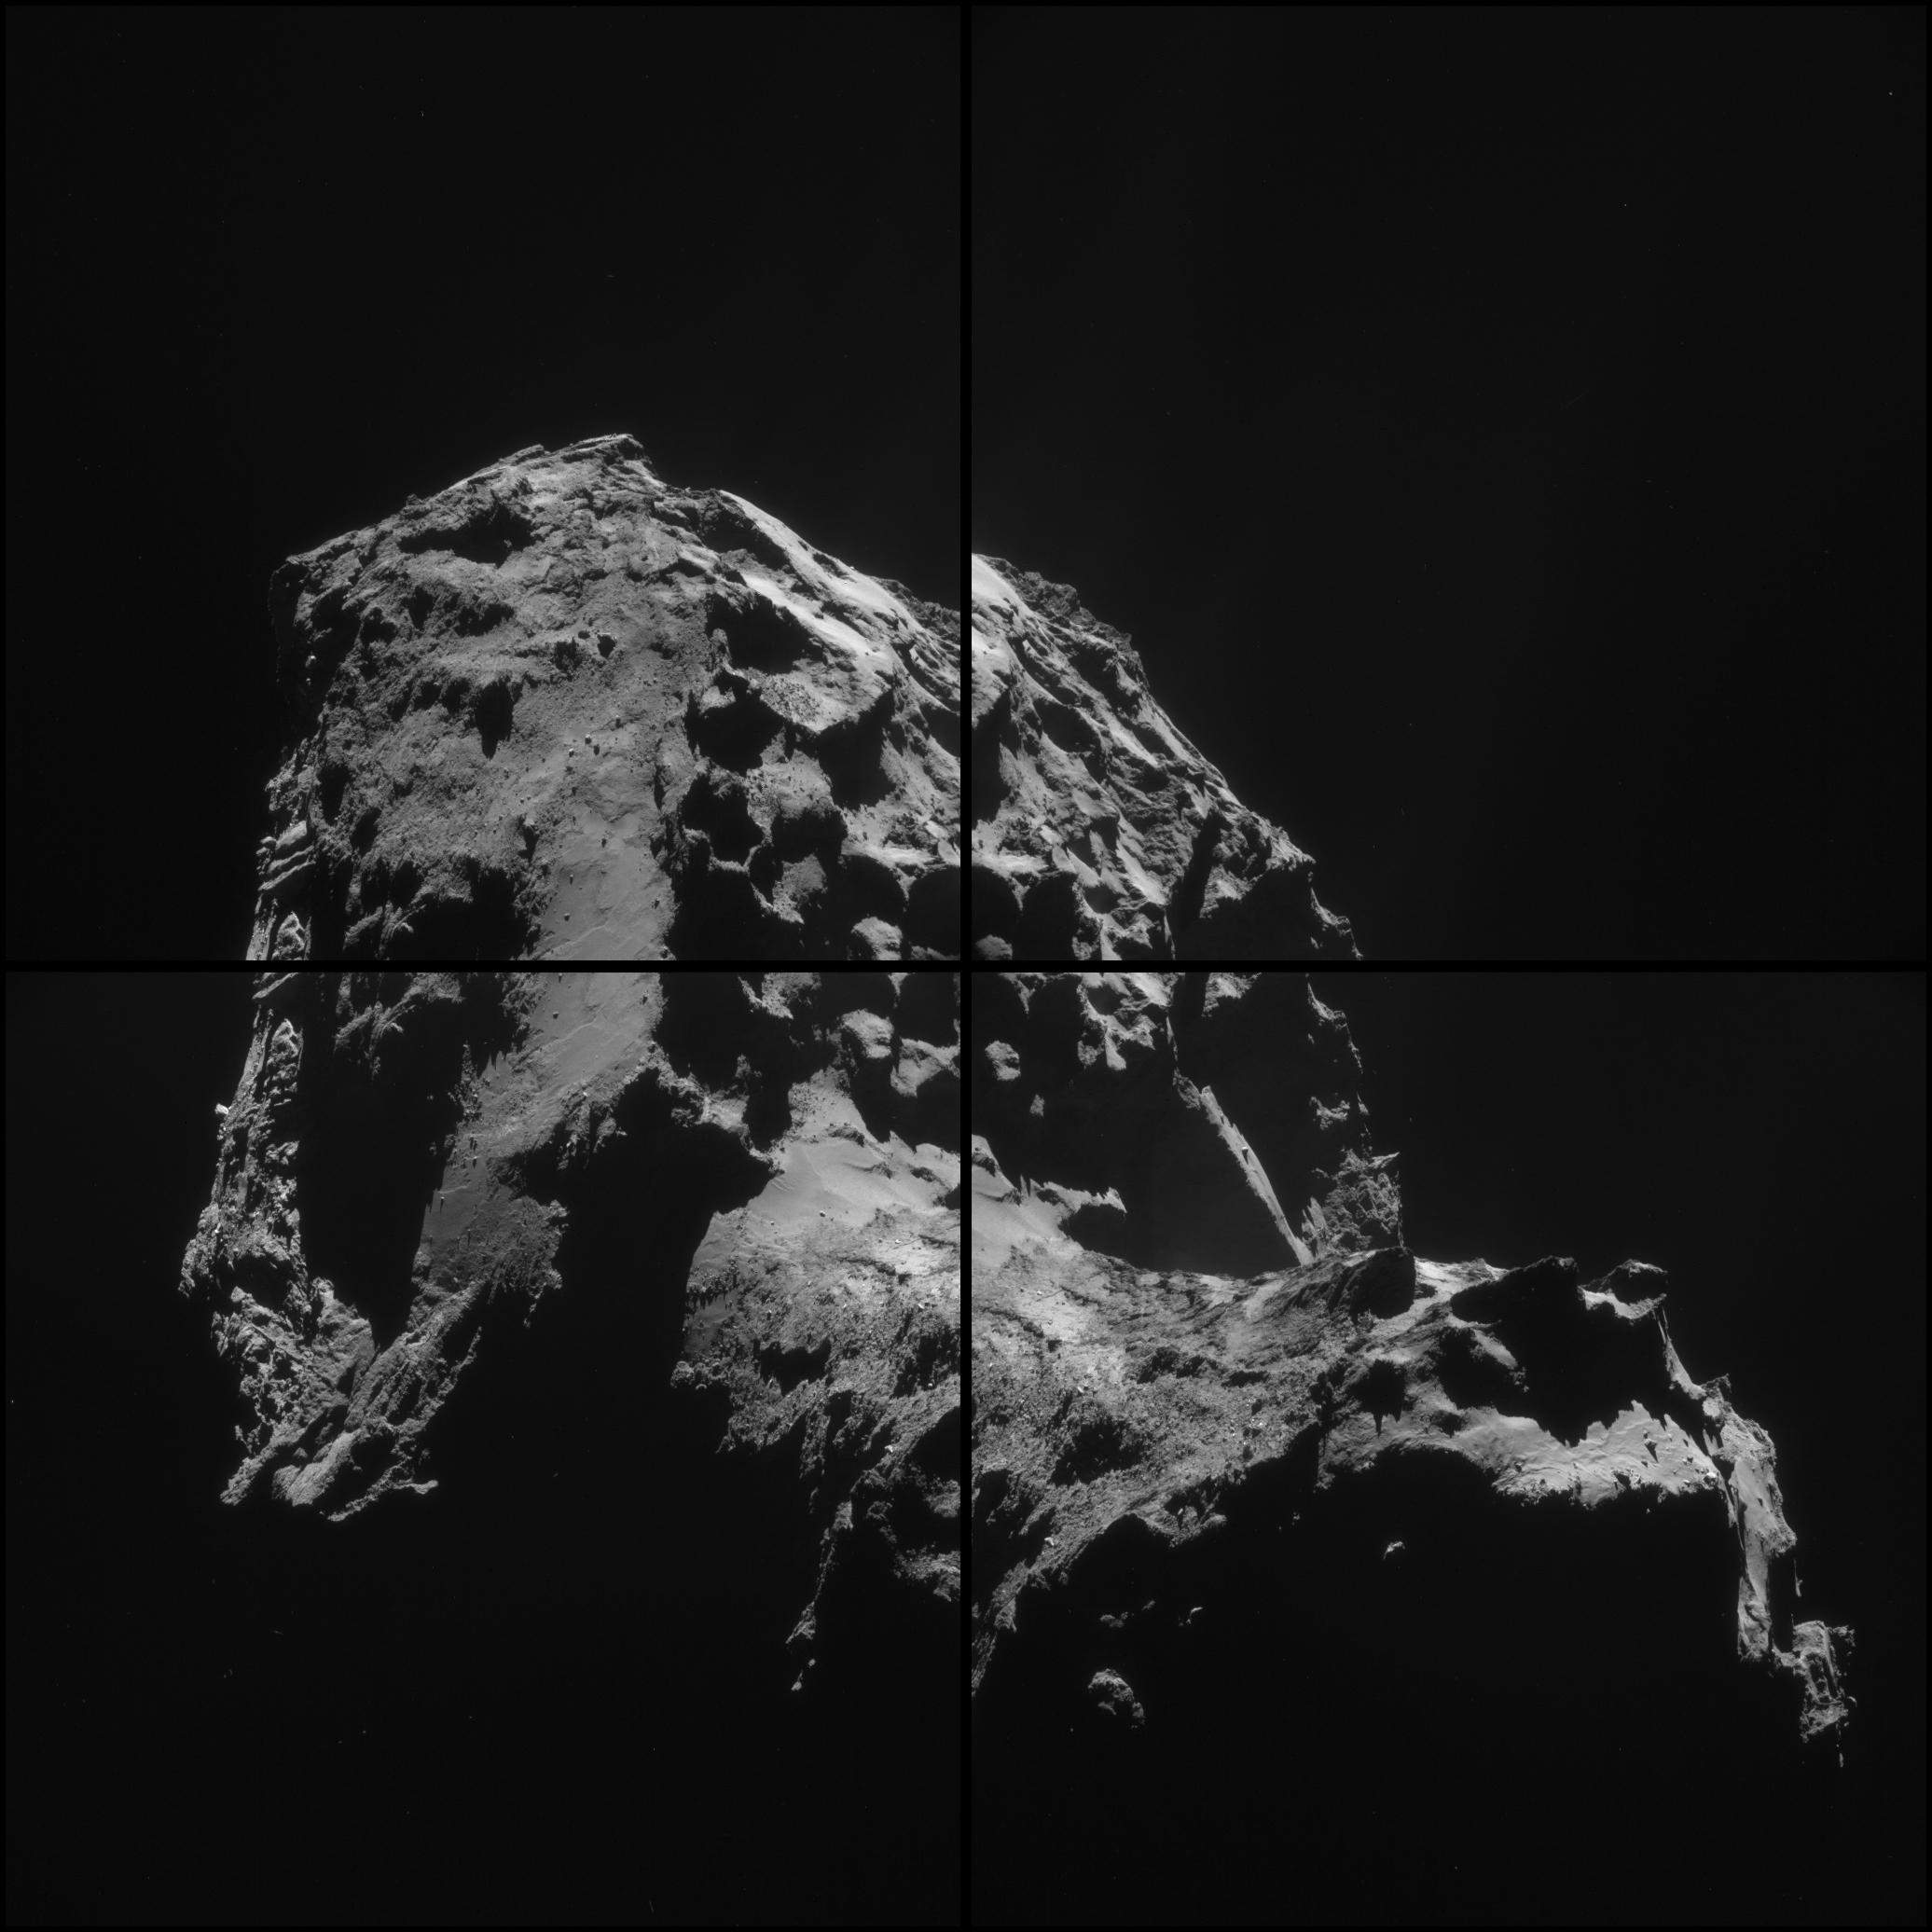 Rosetta in 2015 | Rosetta - ESA's comet chaser